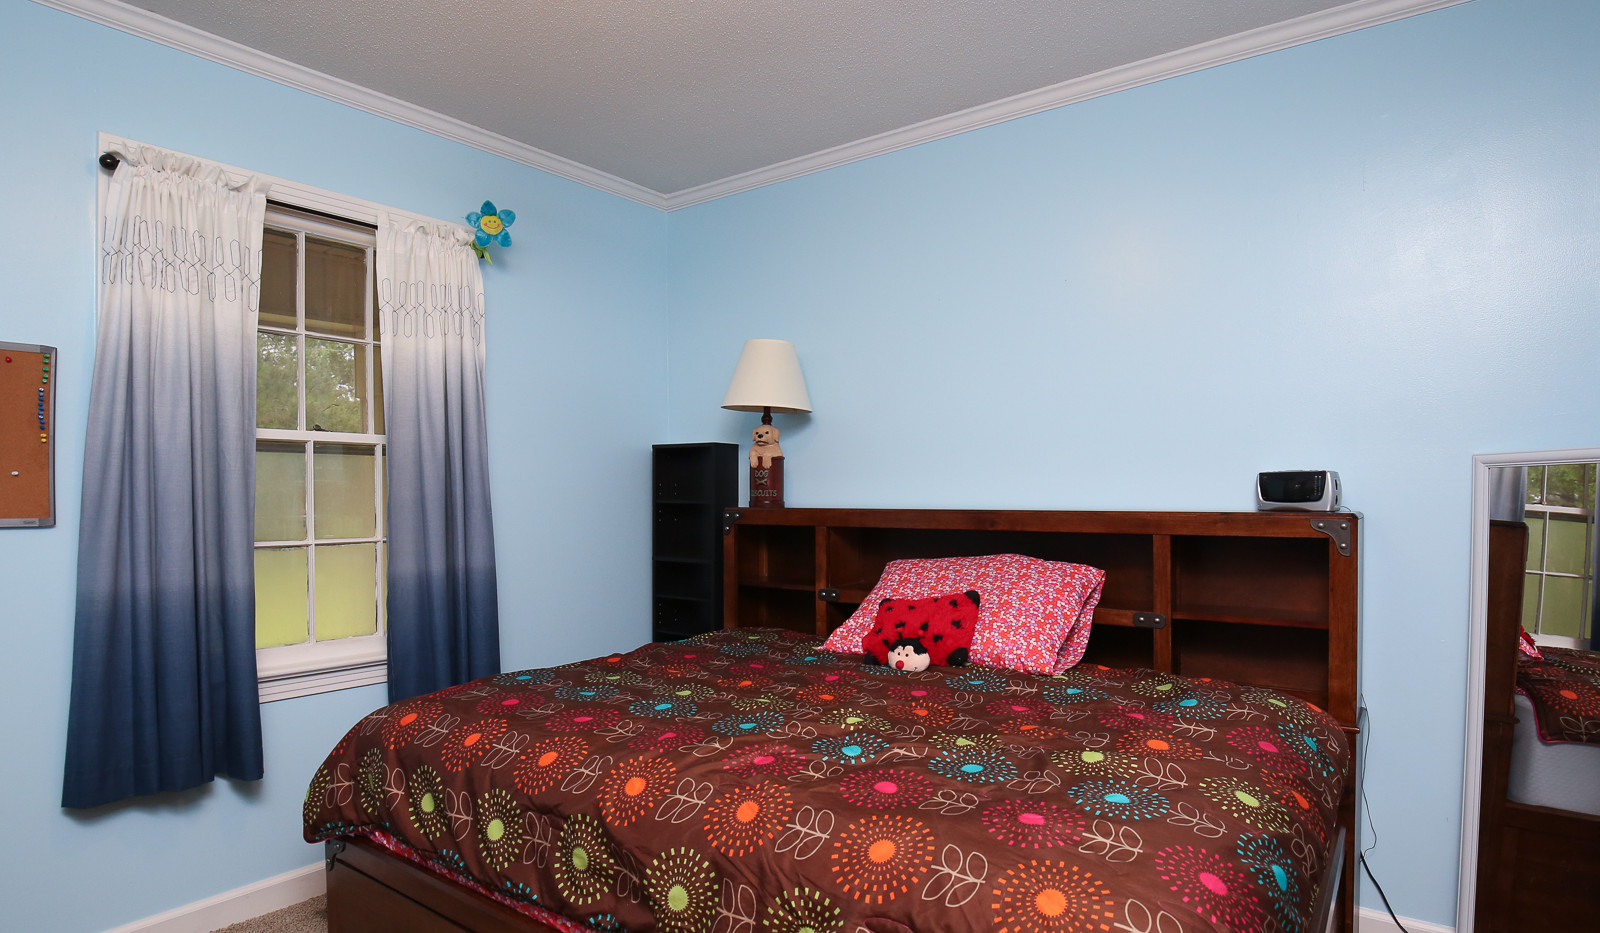 023_294_barnes_ave_bedroom1.jpg